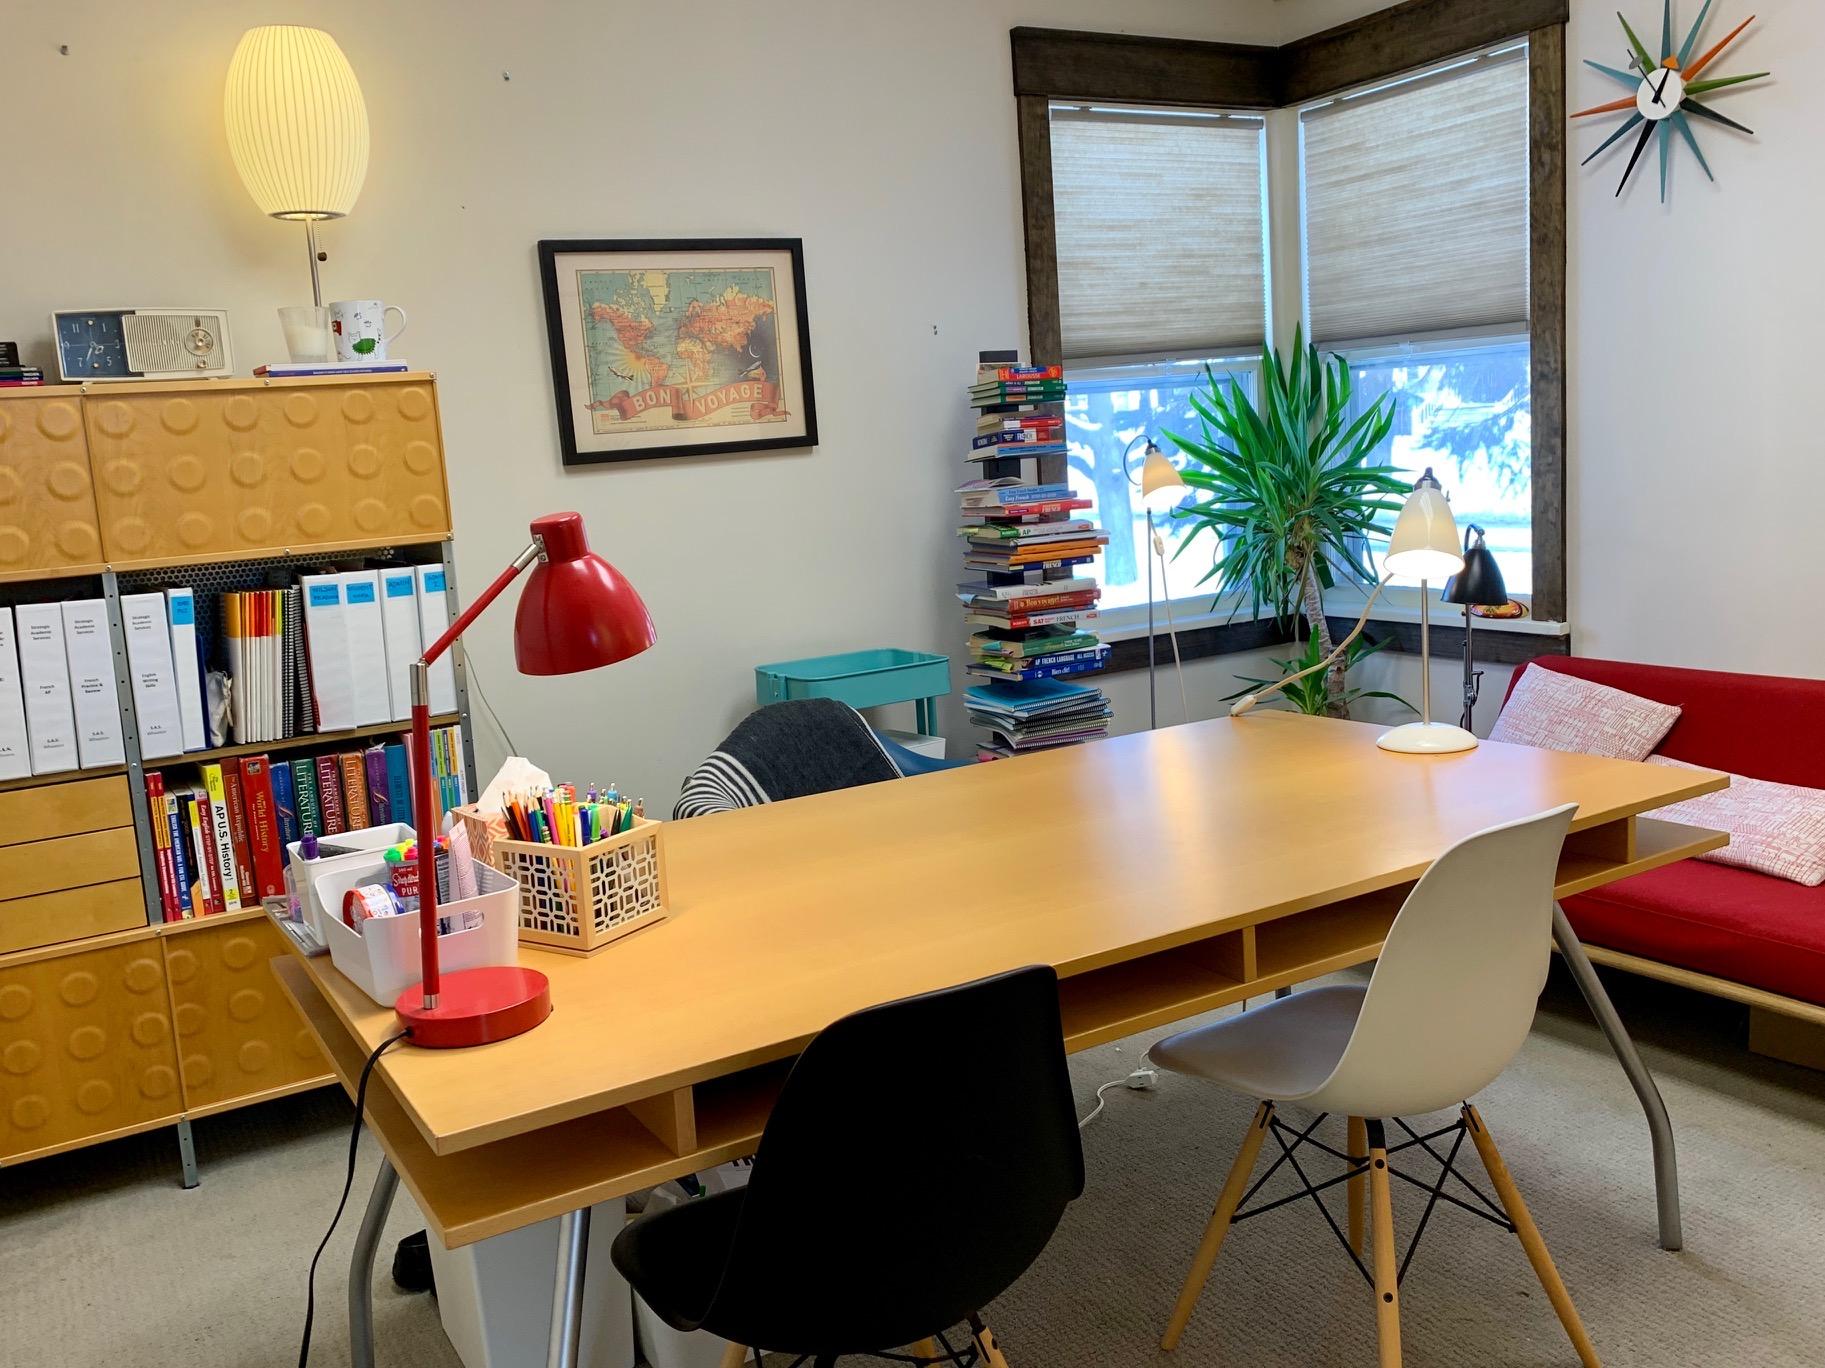 Isabelle's teaching room